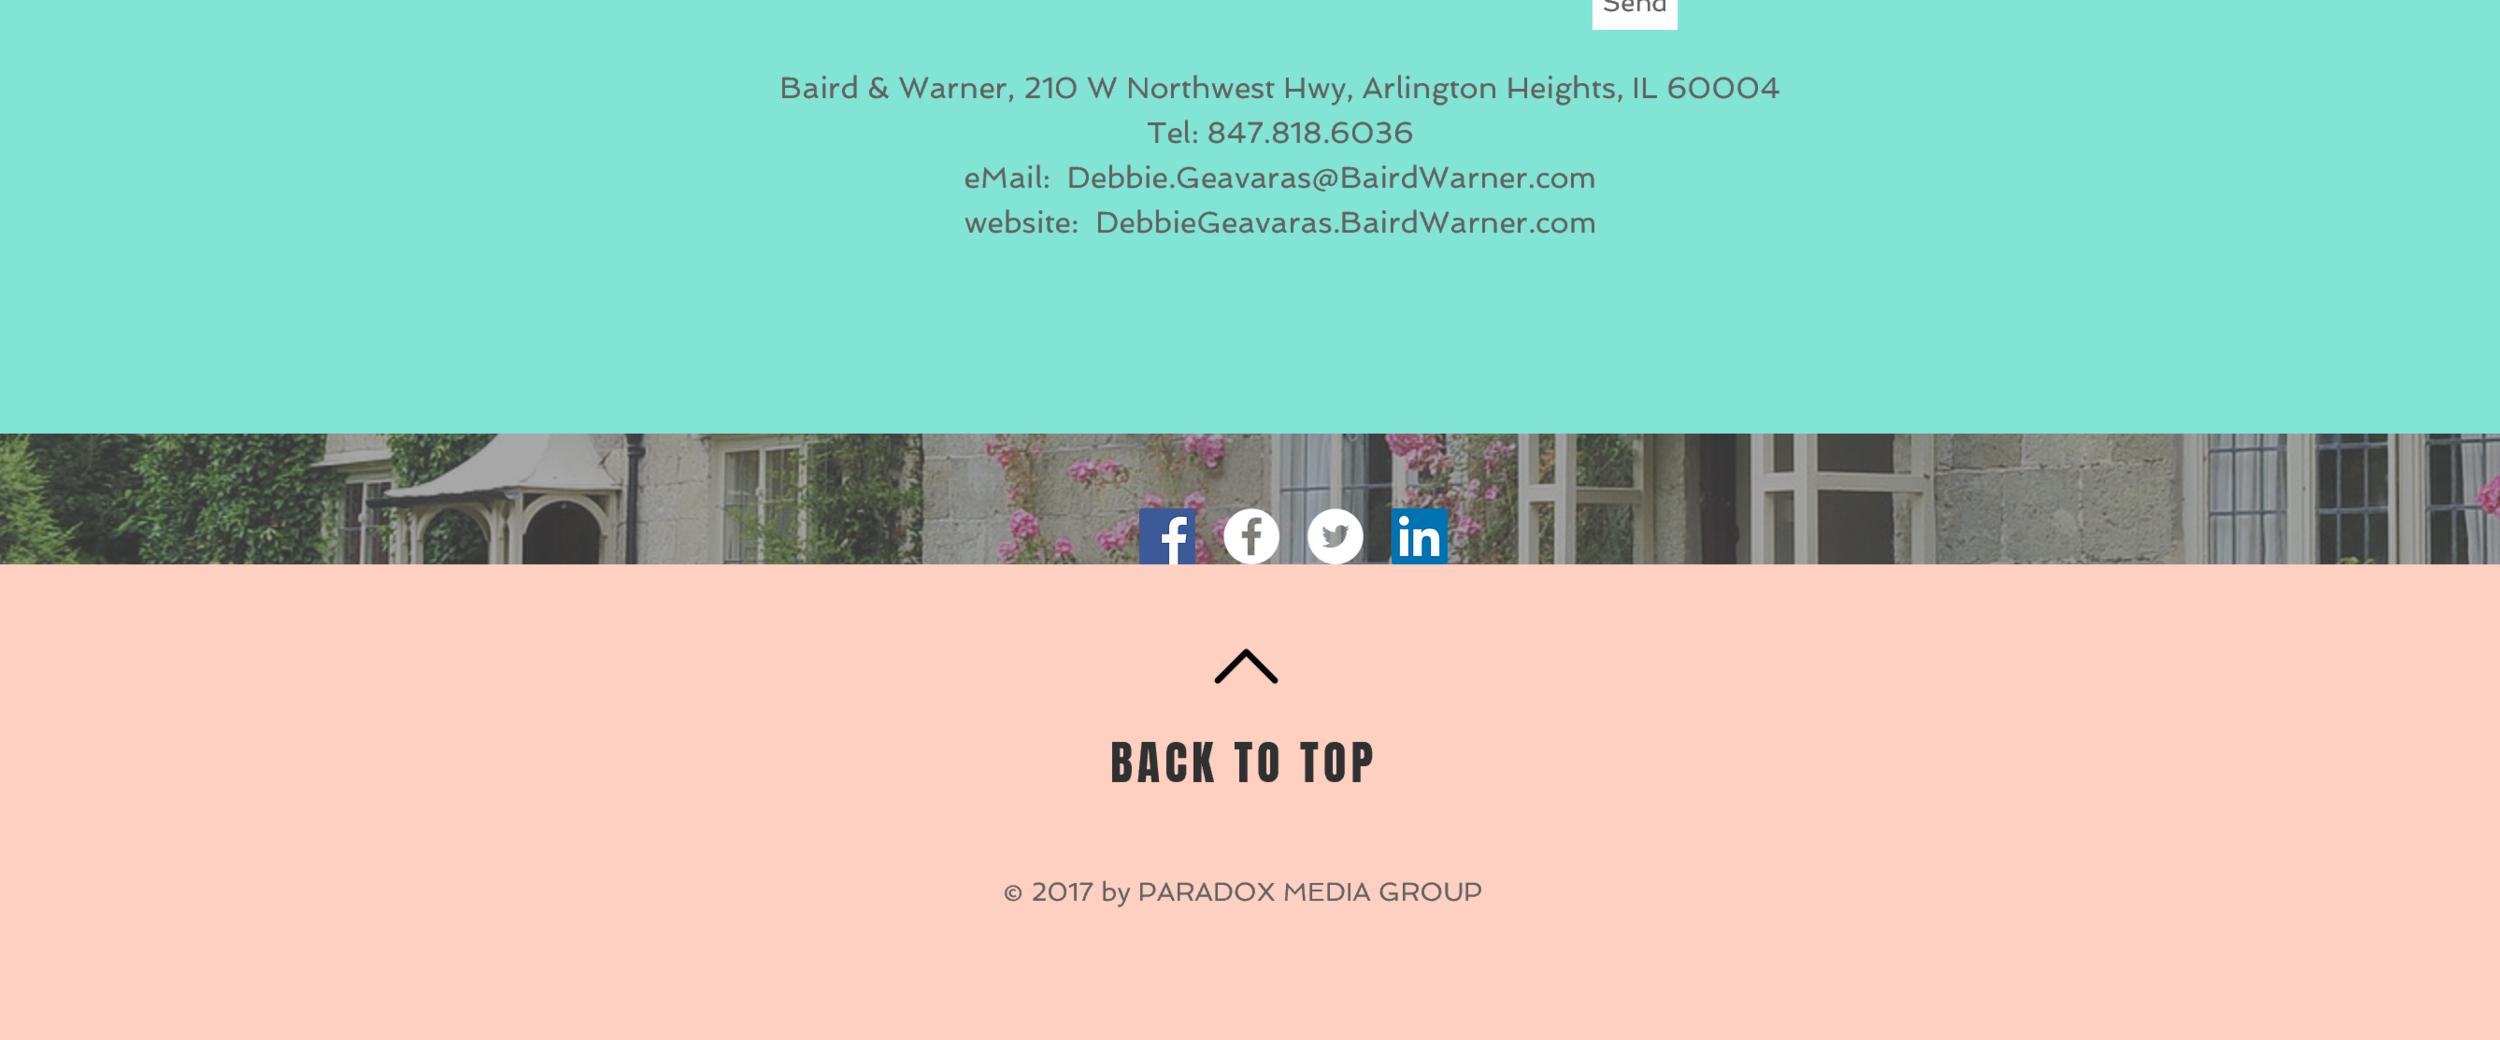 Website design bottom of page for real estate agent